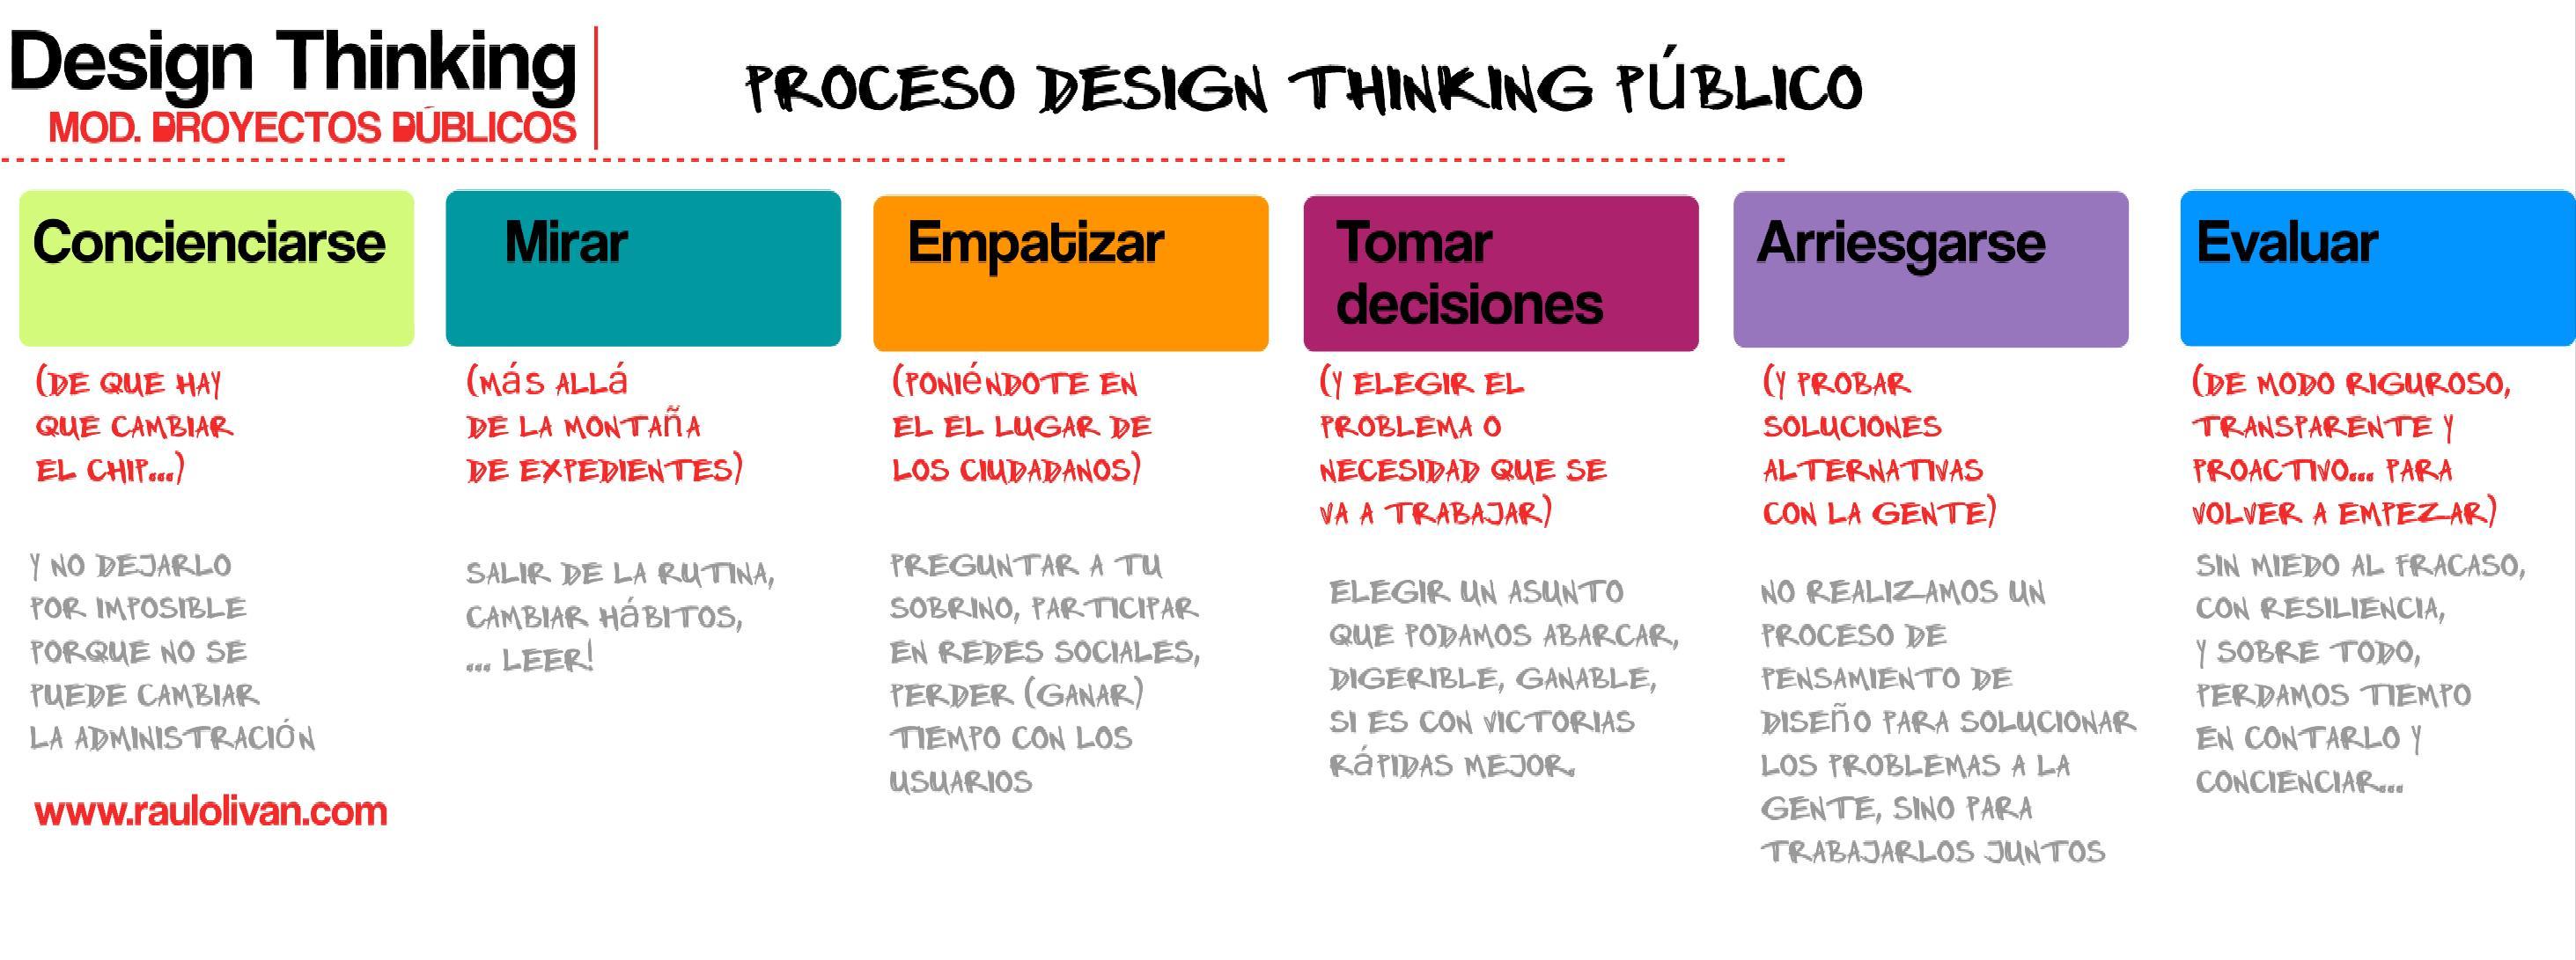 Design Thinking Software